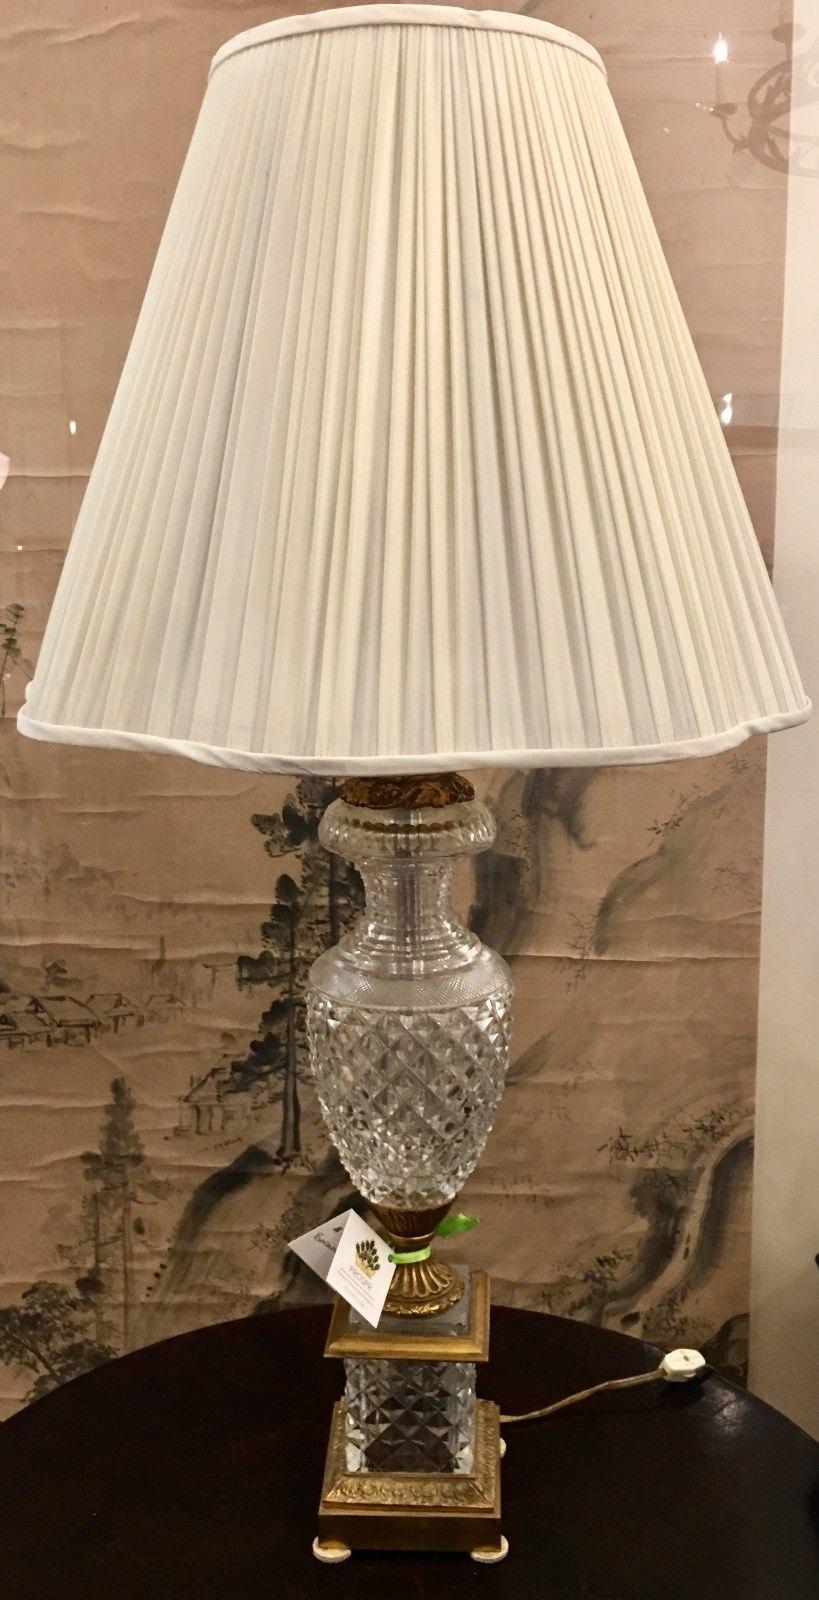 Antique baccarat cut crystal gilt bronze urn lamp image 2